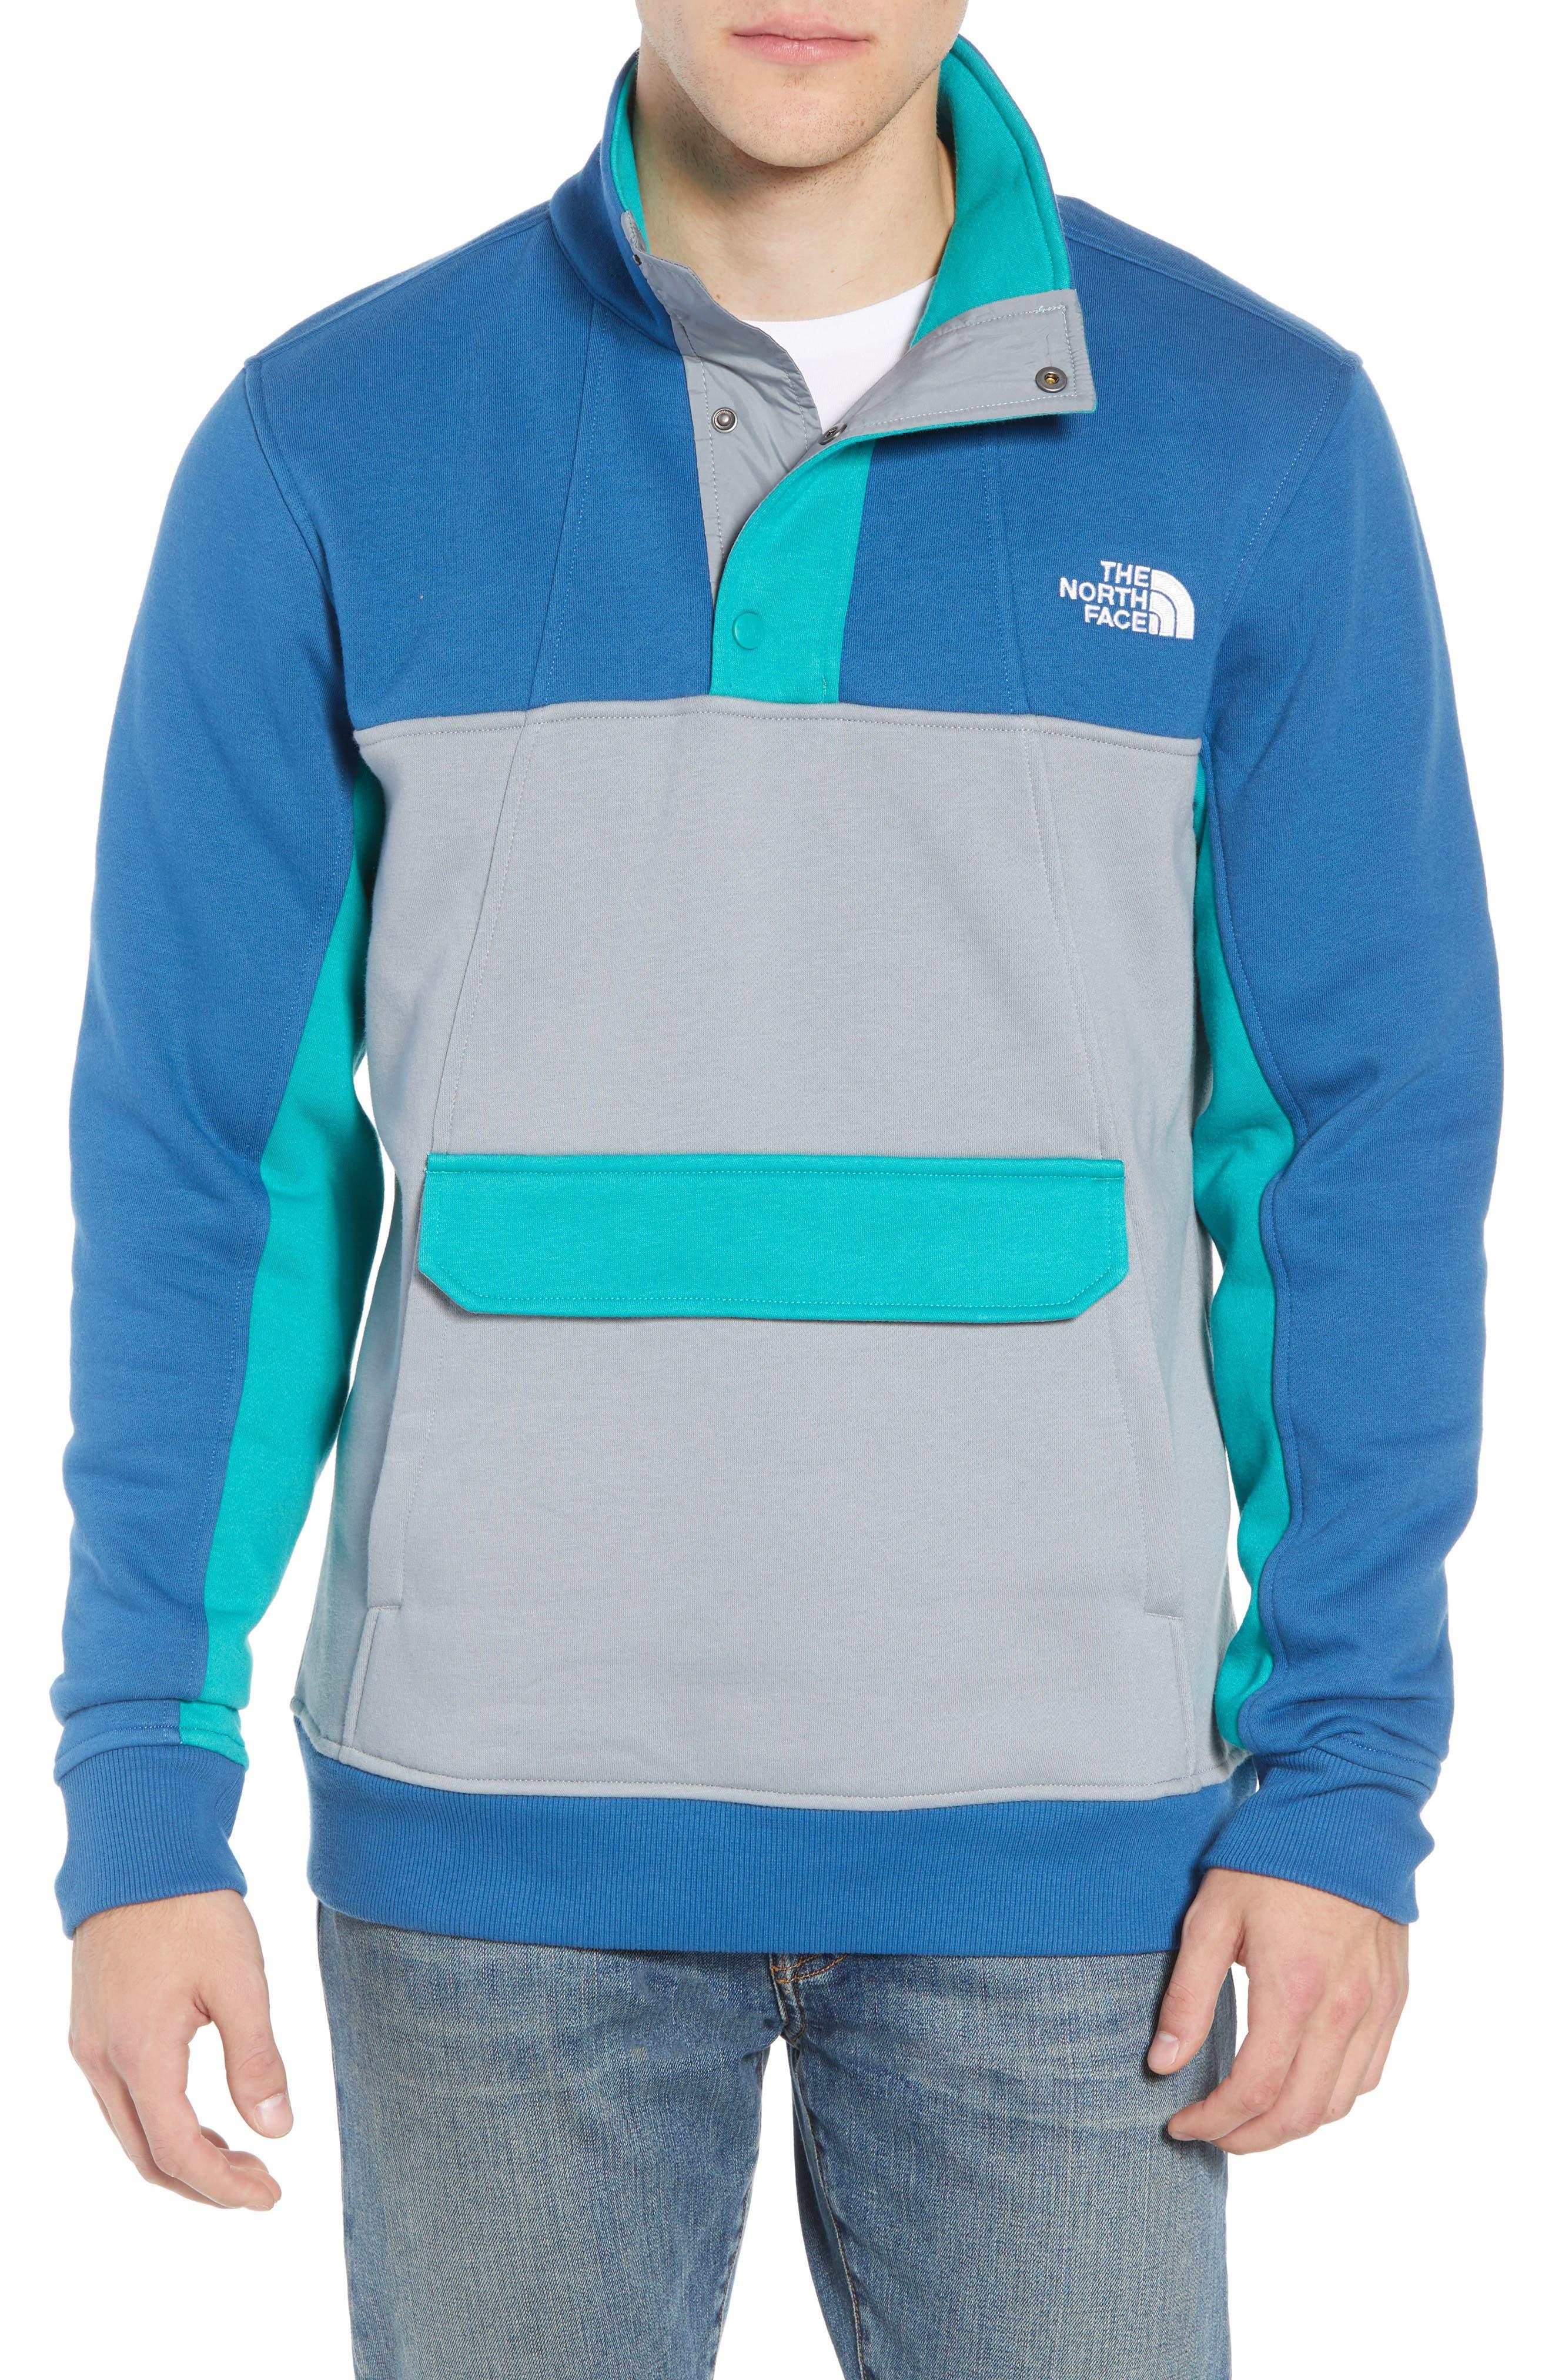 Alphabet City Fleece Pullover,                         Main,                         color, DISH BLUE/ MID GREY/ GREEN